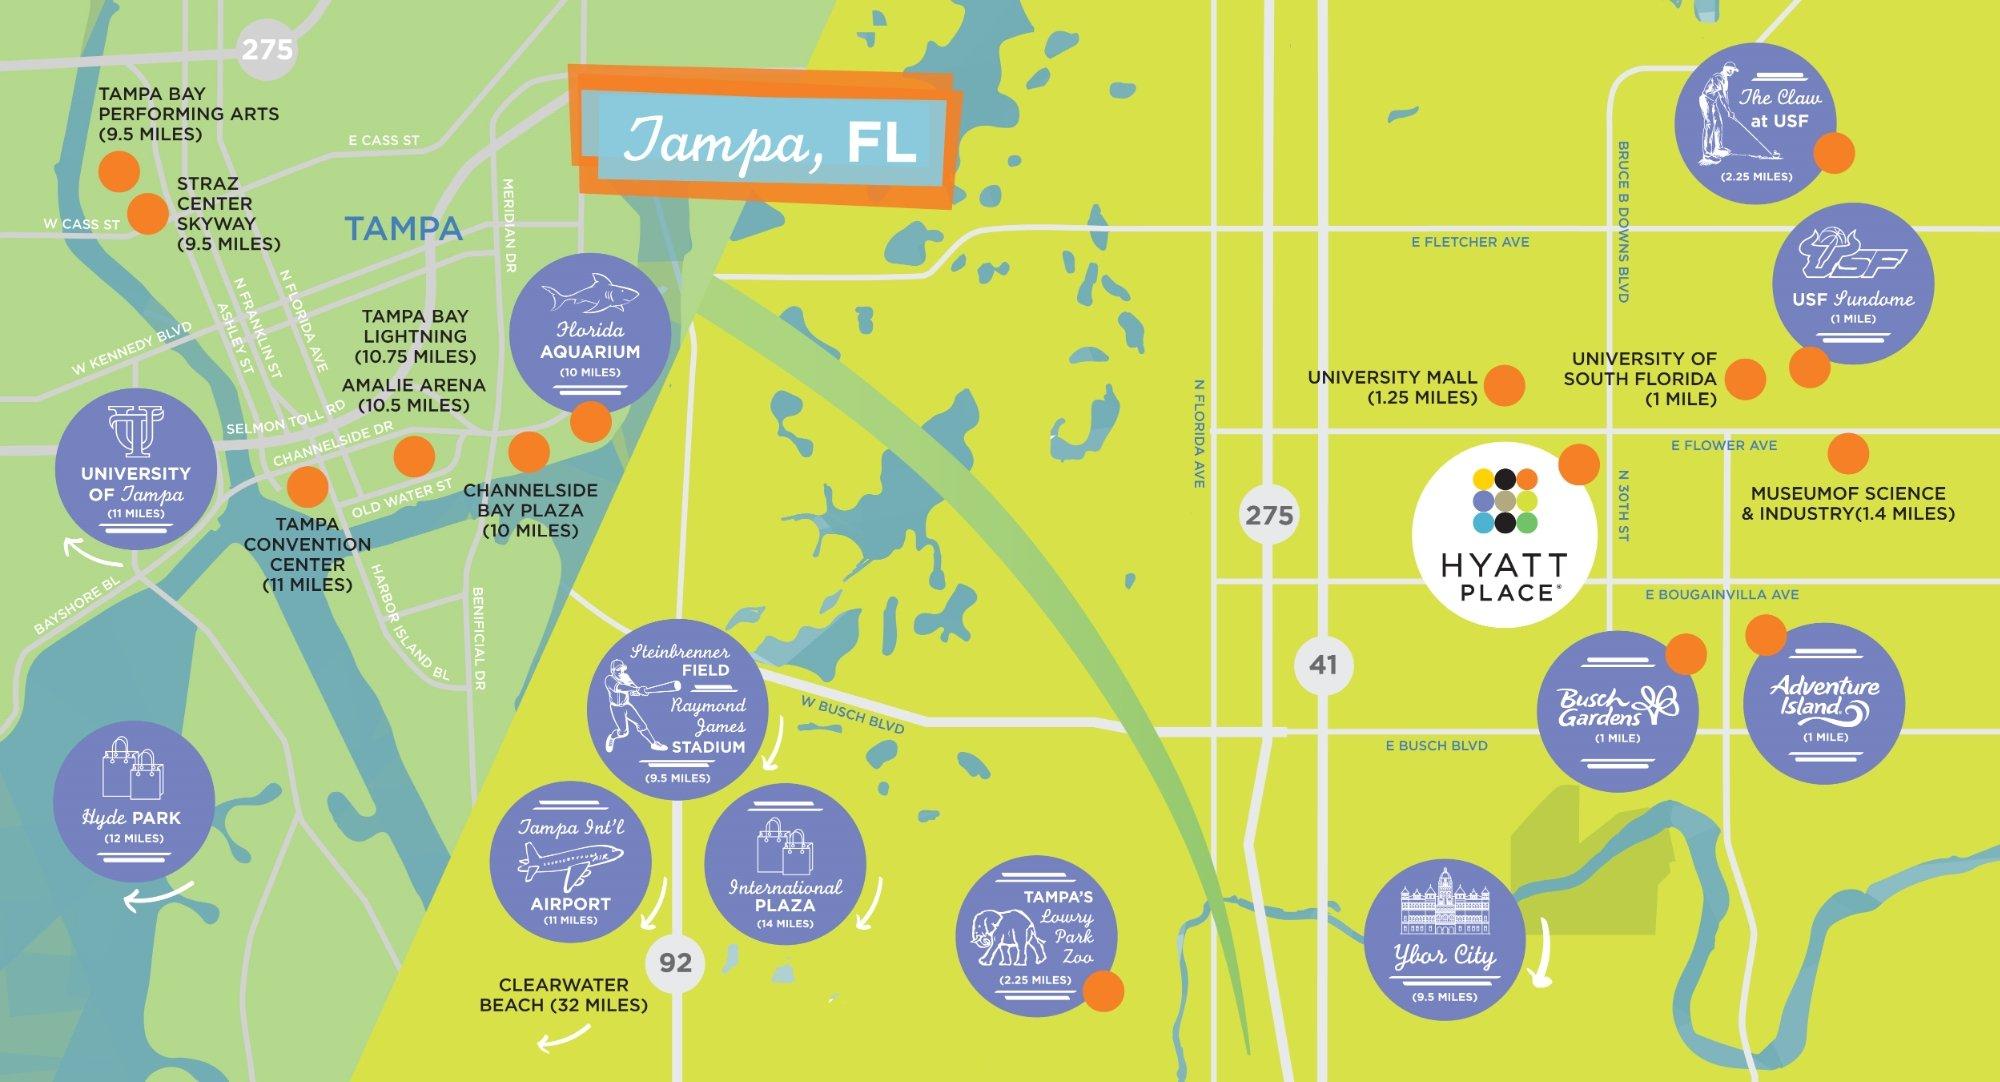 Hyatt Place Busch Gardens UPDATED 2017 Hotel Reviews Price